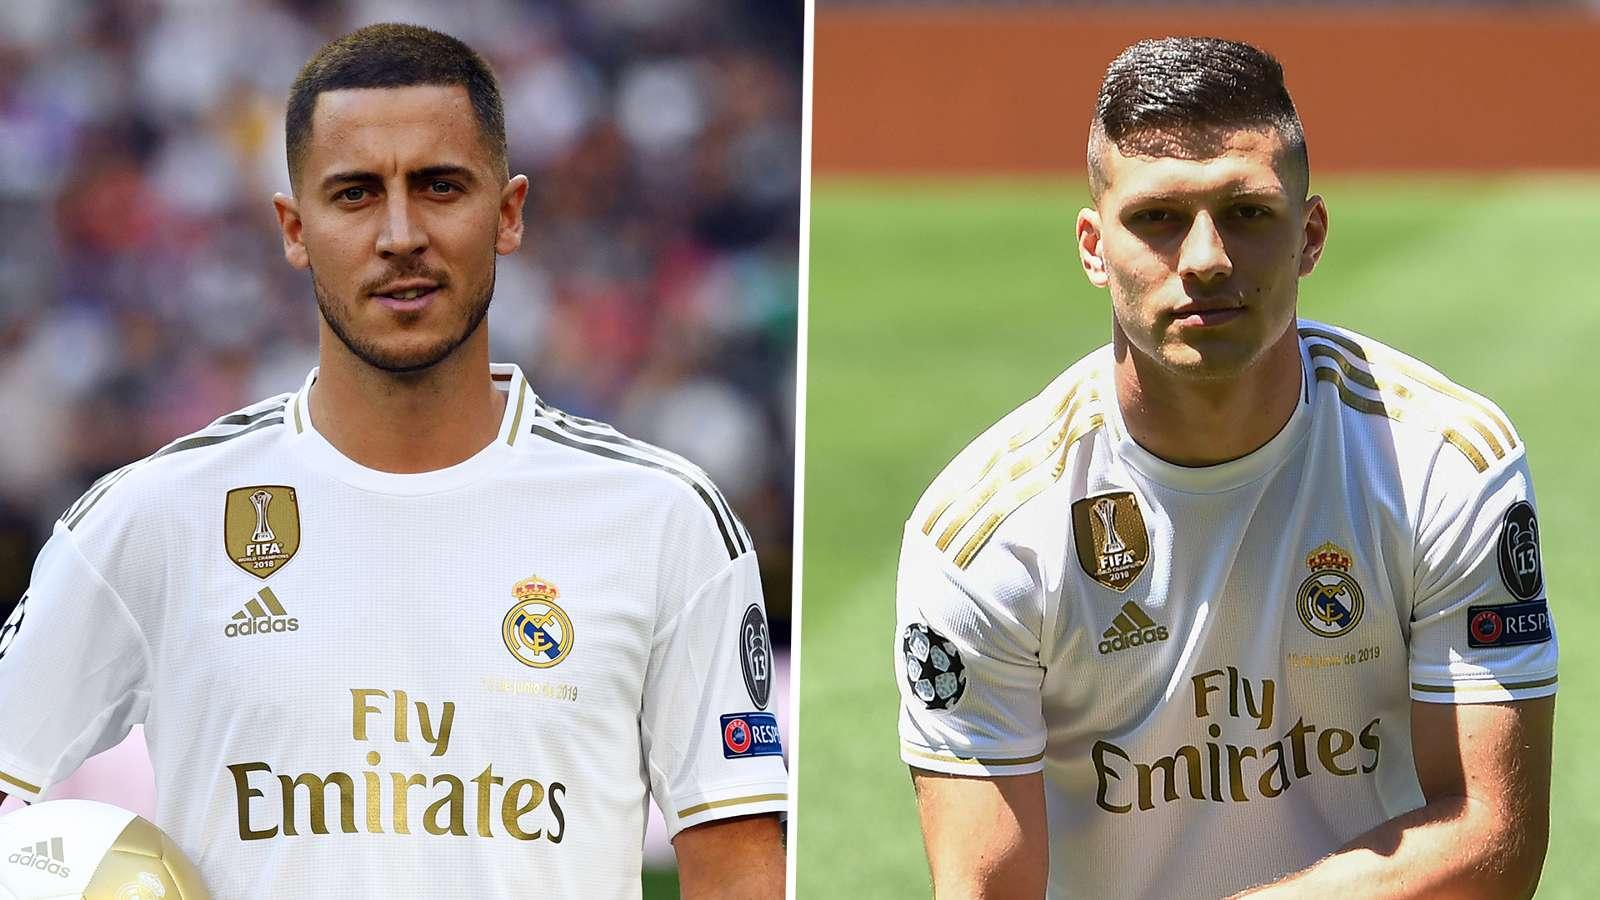 Real Madrid 'want Kylian Mbappe, Erling Braut Haaland, Eden Hazard front three' - Bóng Đá